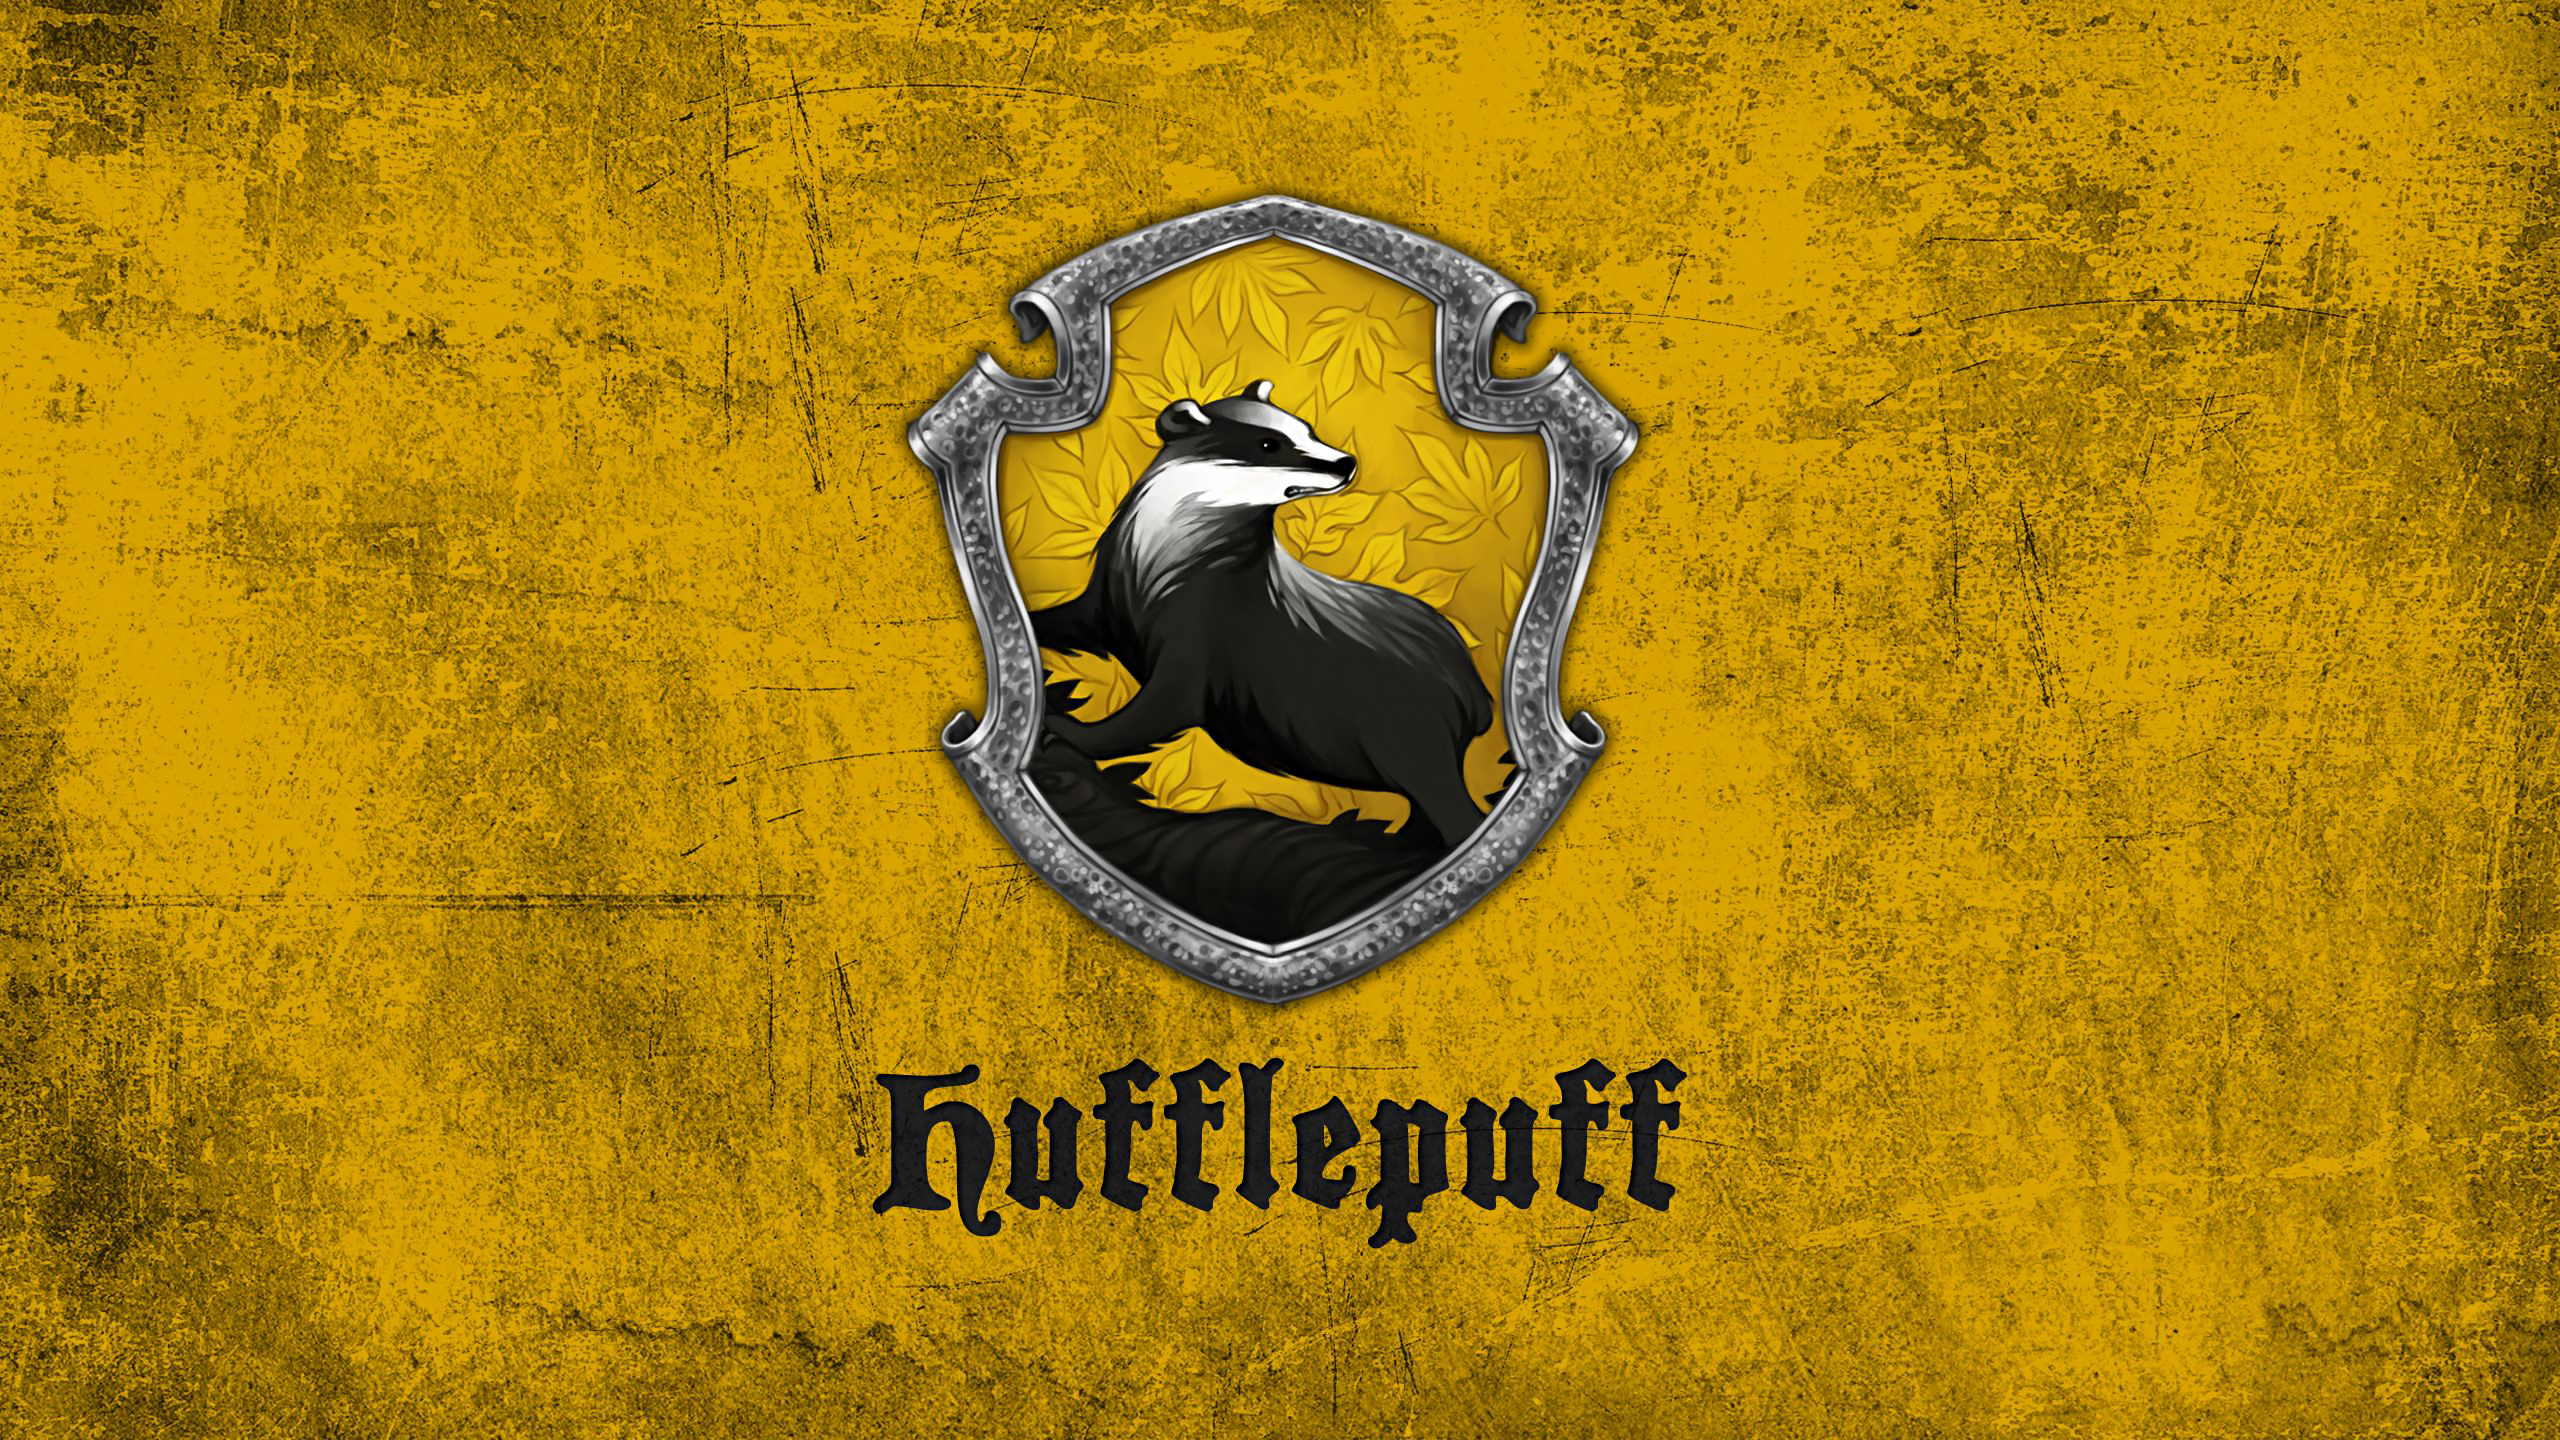 Fondos de pantalla Insignia Hufflepuff de Harry Potter